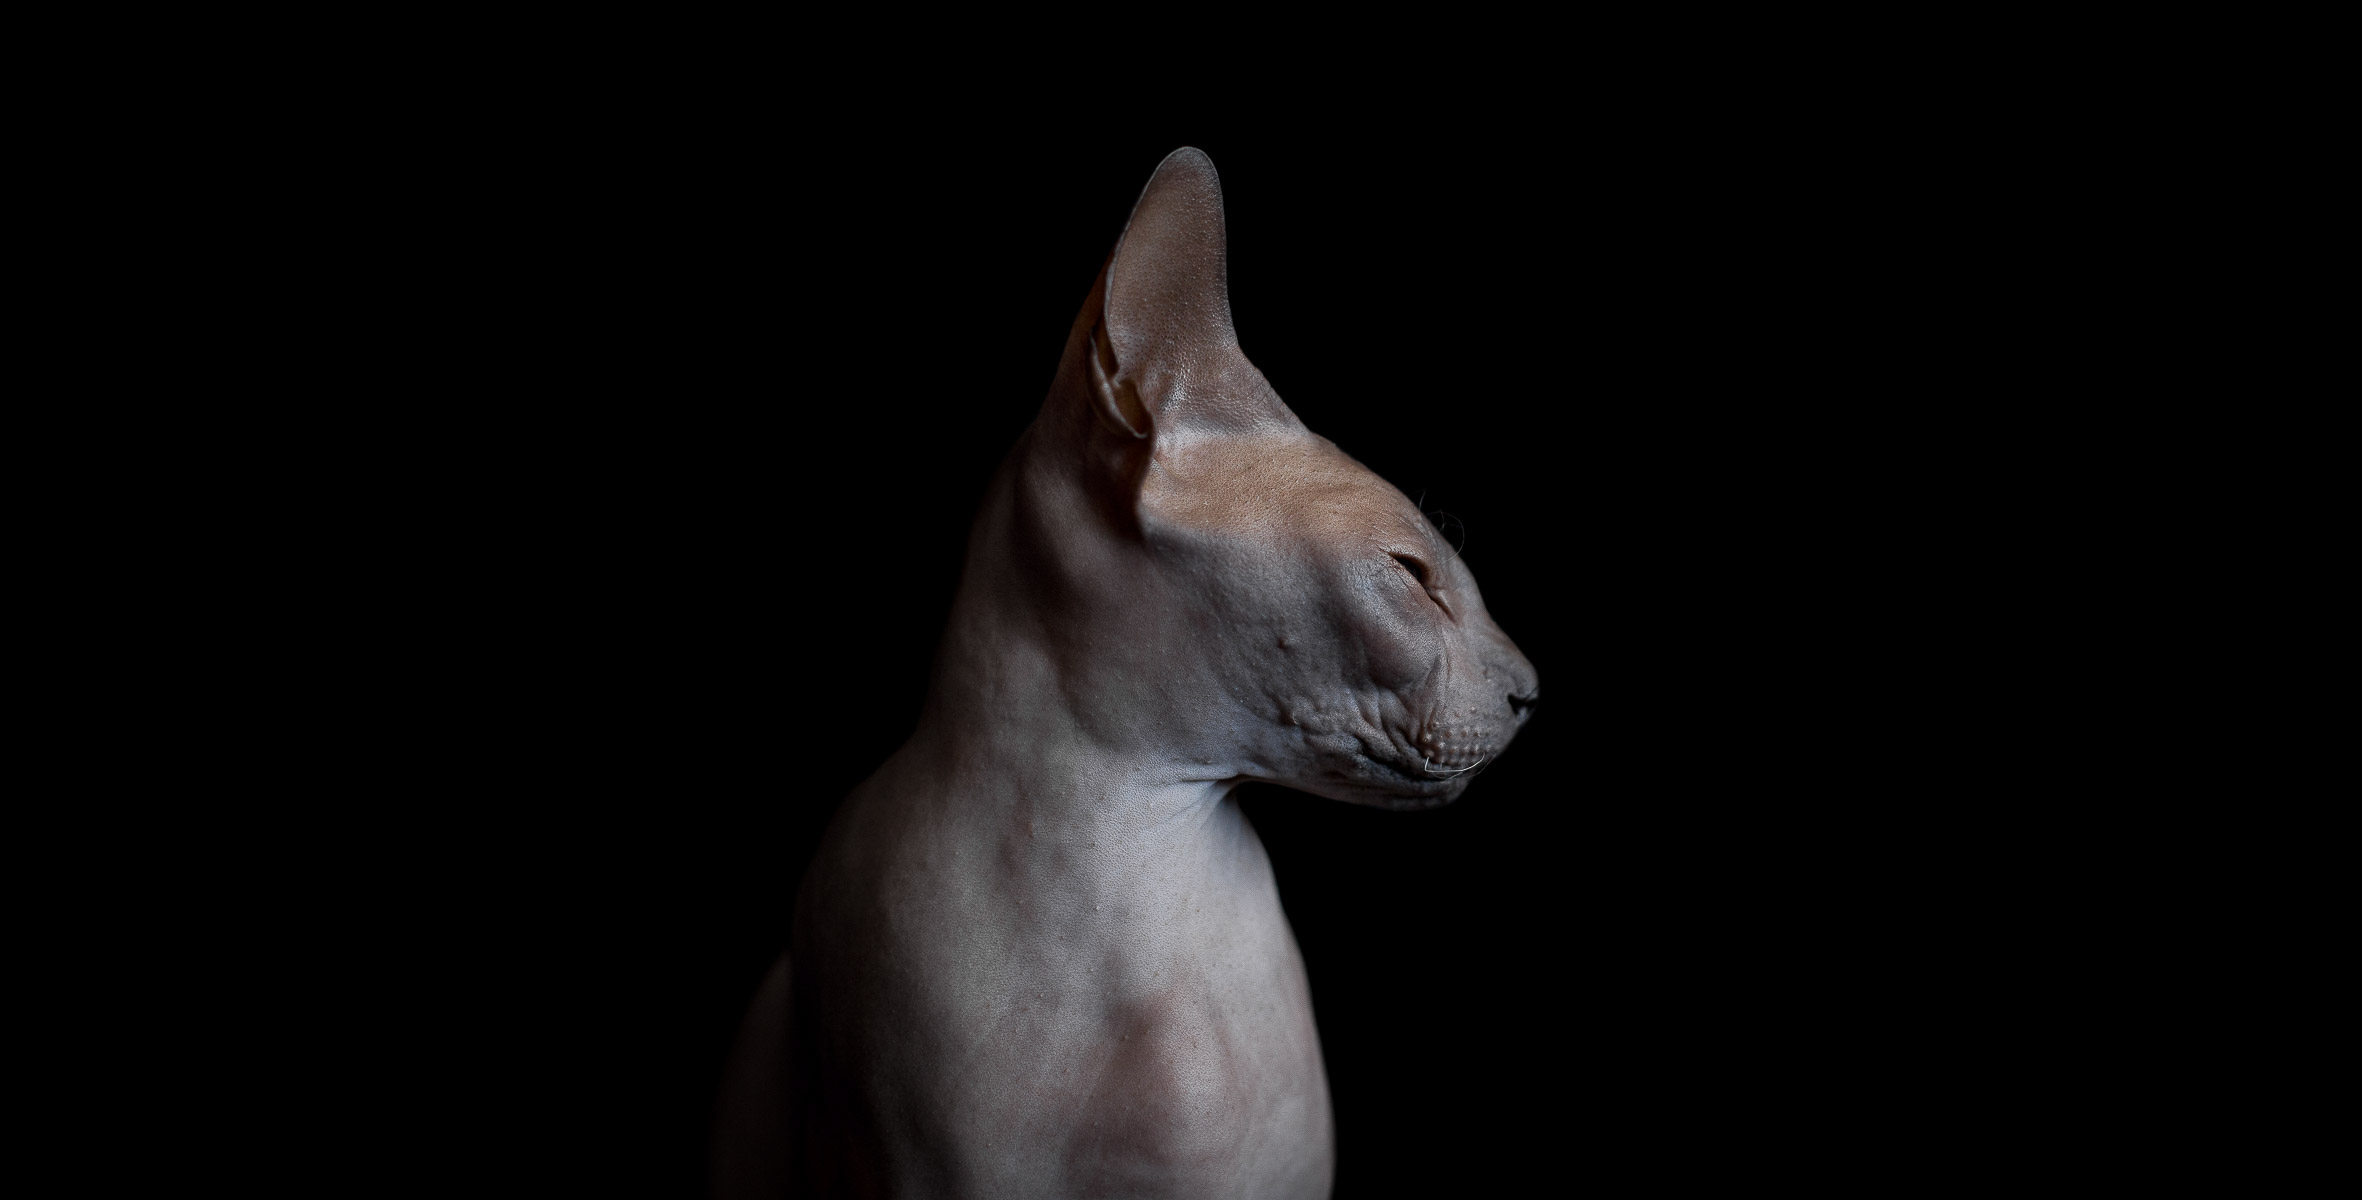 sphynx-cat-photos-by-alicia-rius-21.jpg